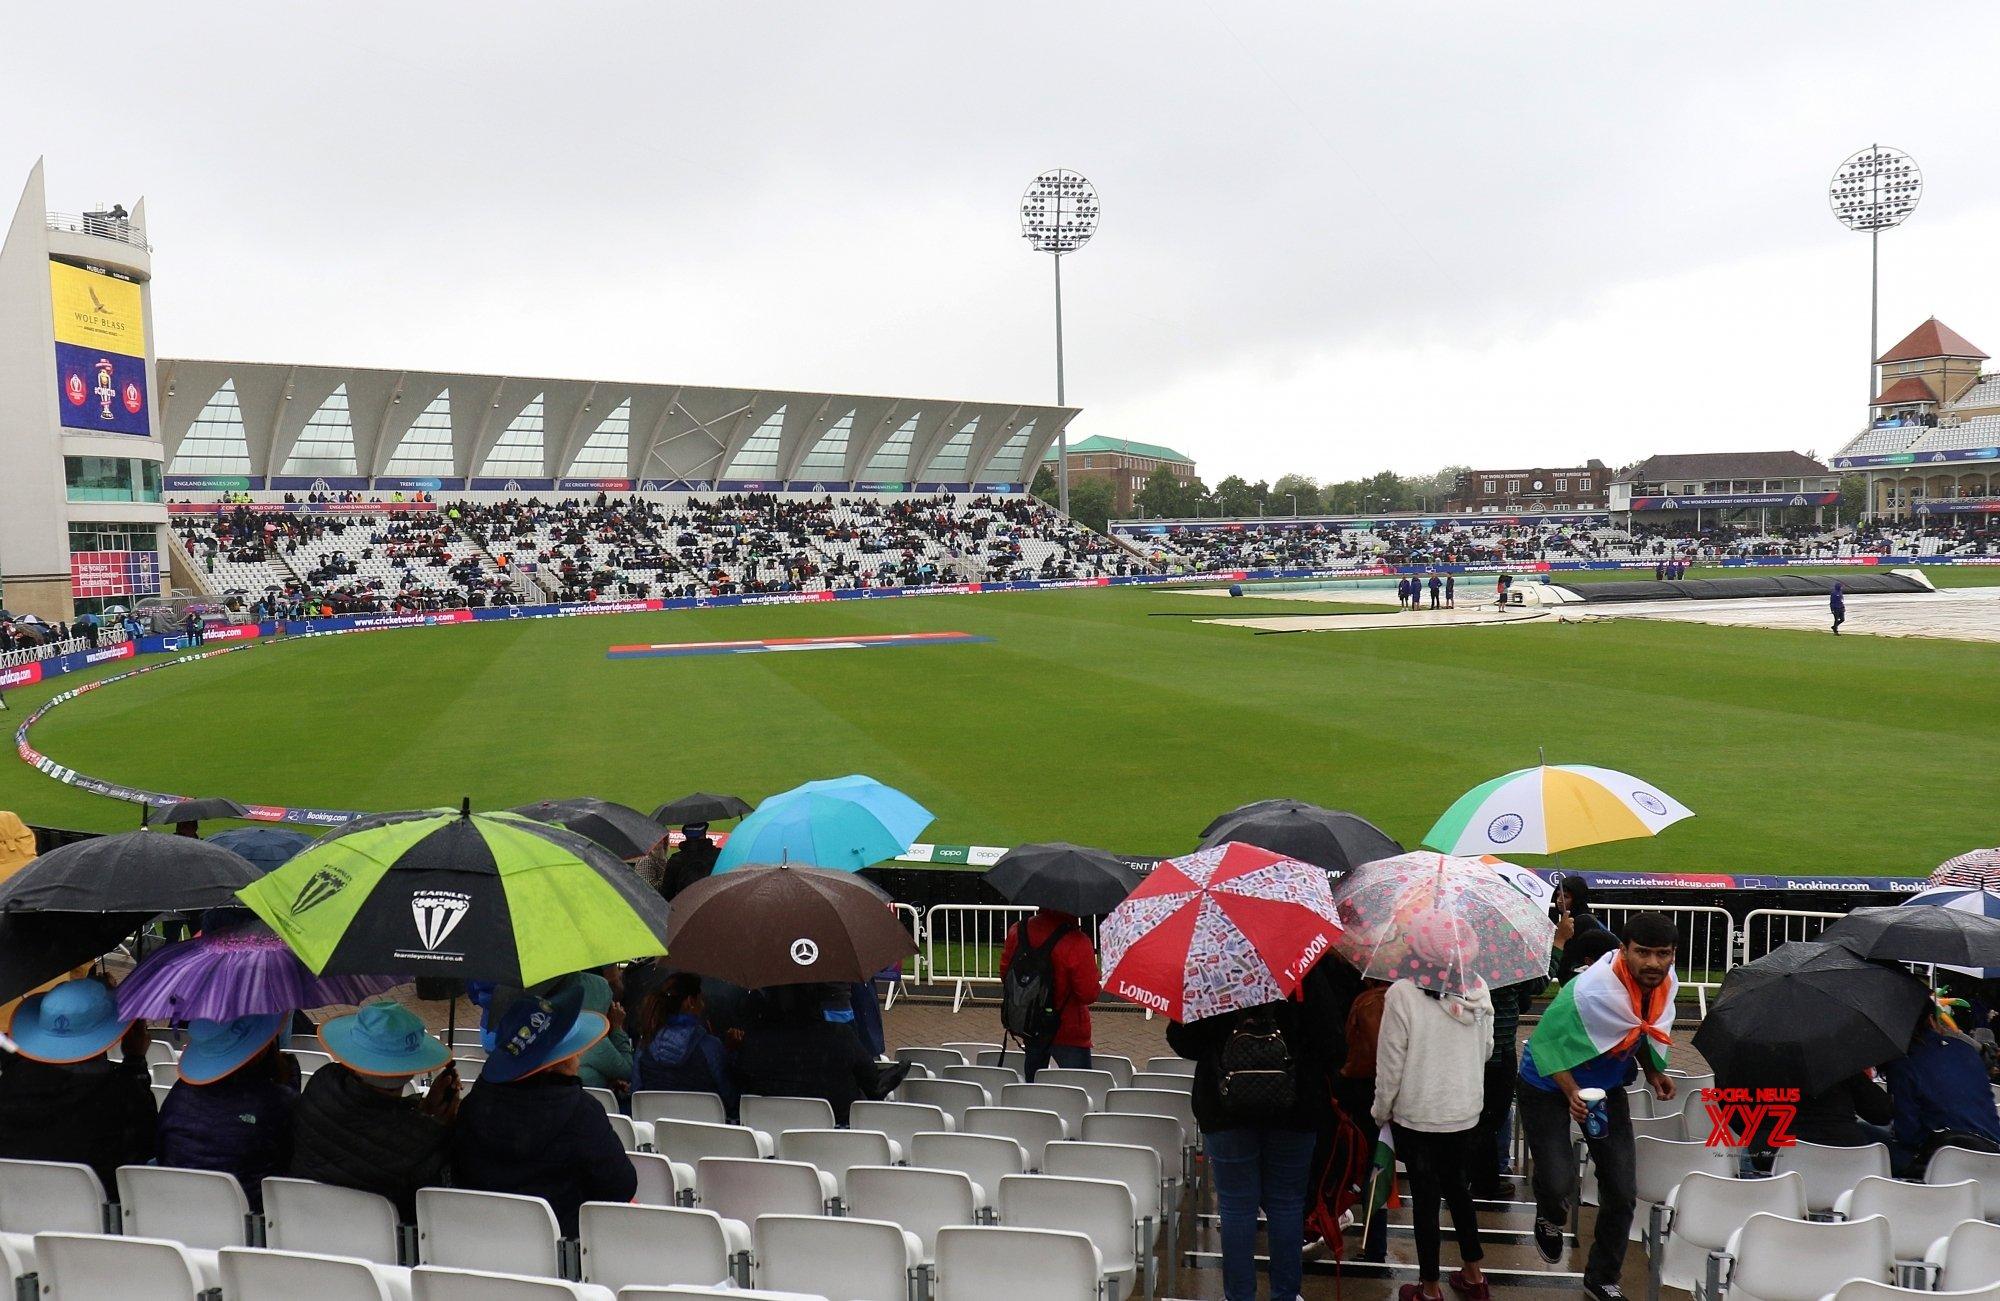 Nottingham (England): World Cup 2019 - Match 18 - India Vs New Zealand (Batch - 10) #Gallery